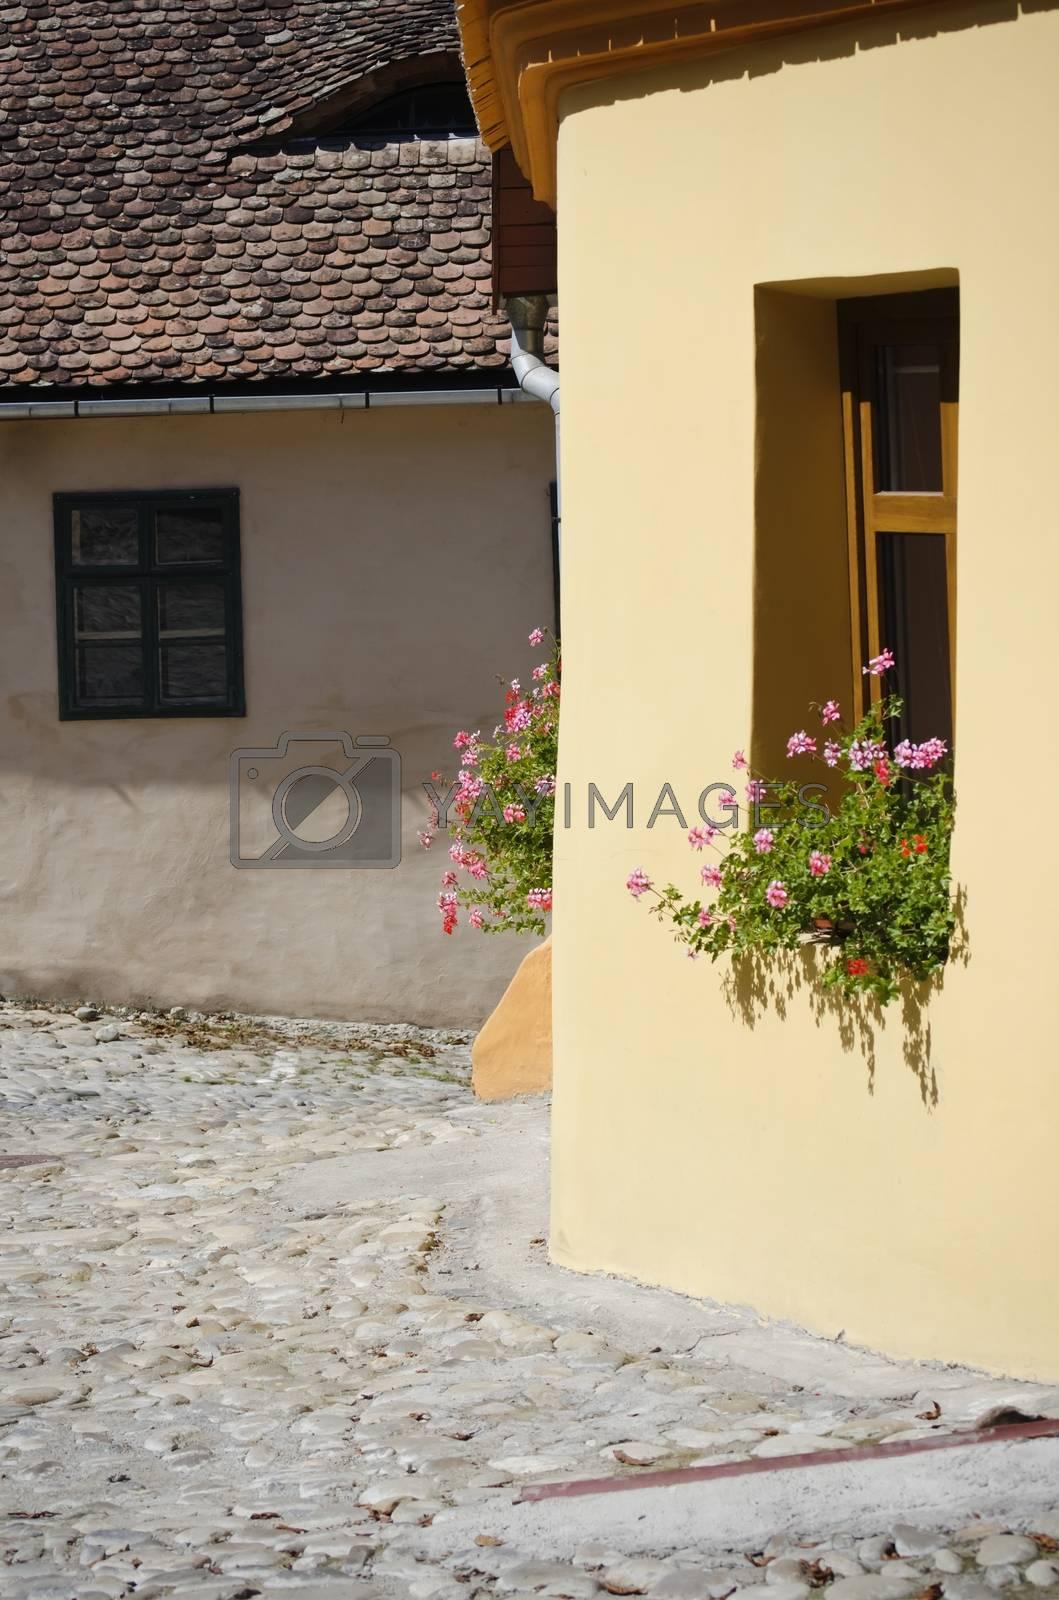 Medieval Town Sighisoara Romania by razvodovska